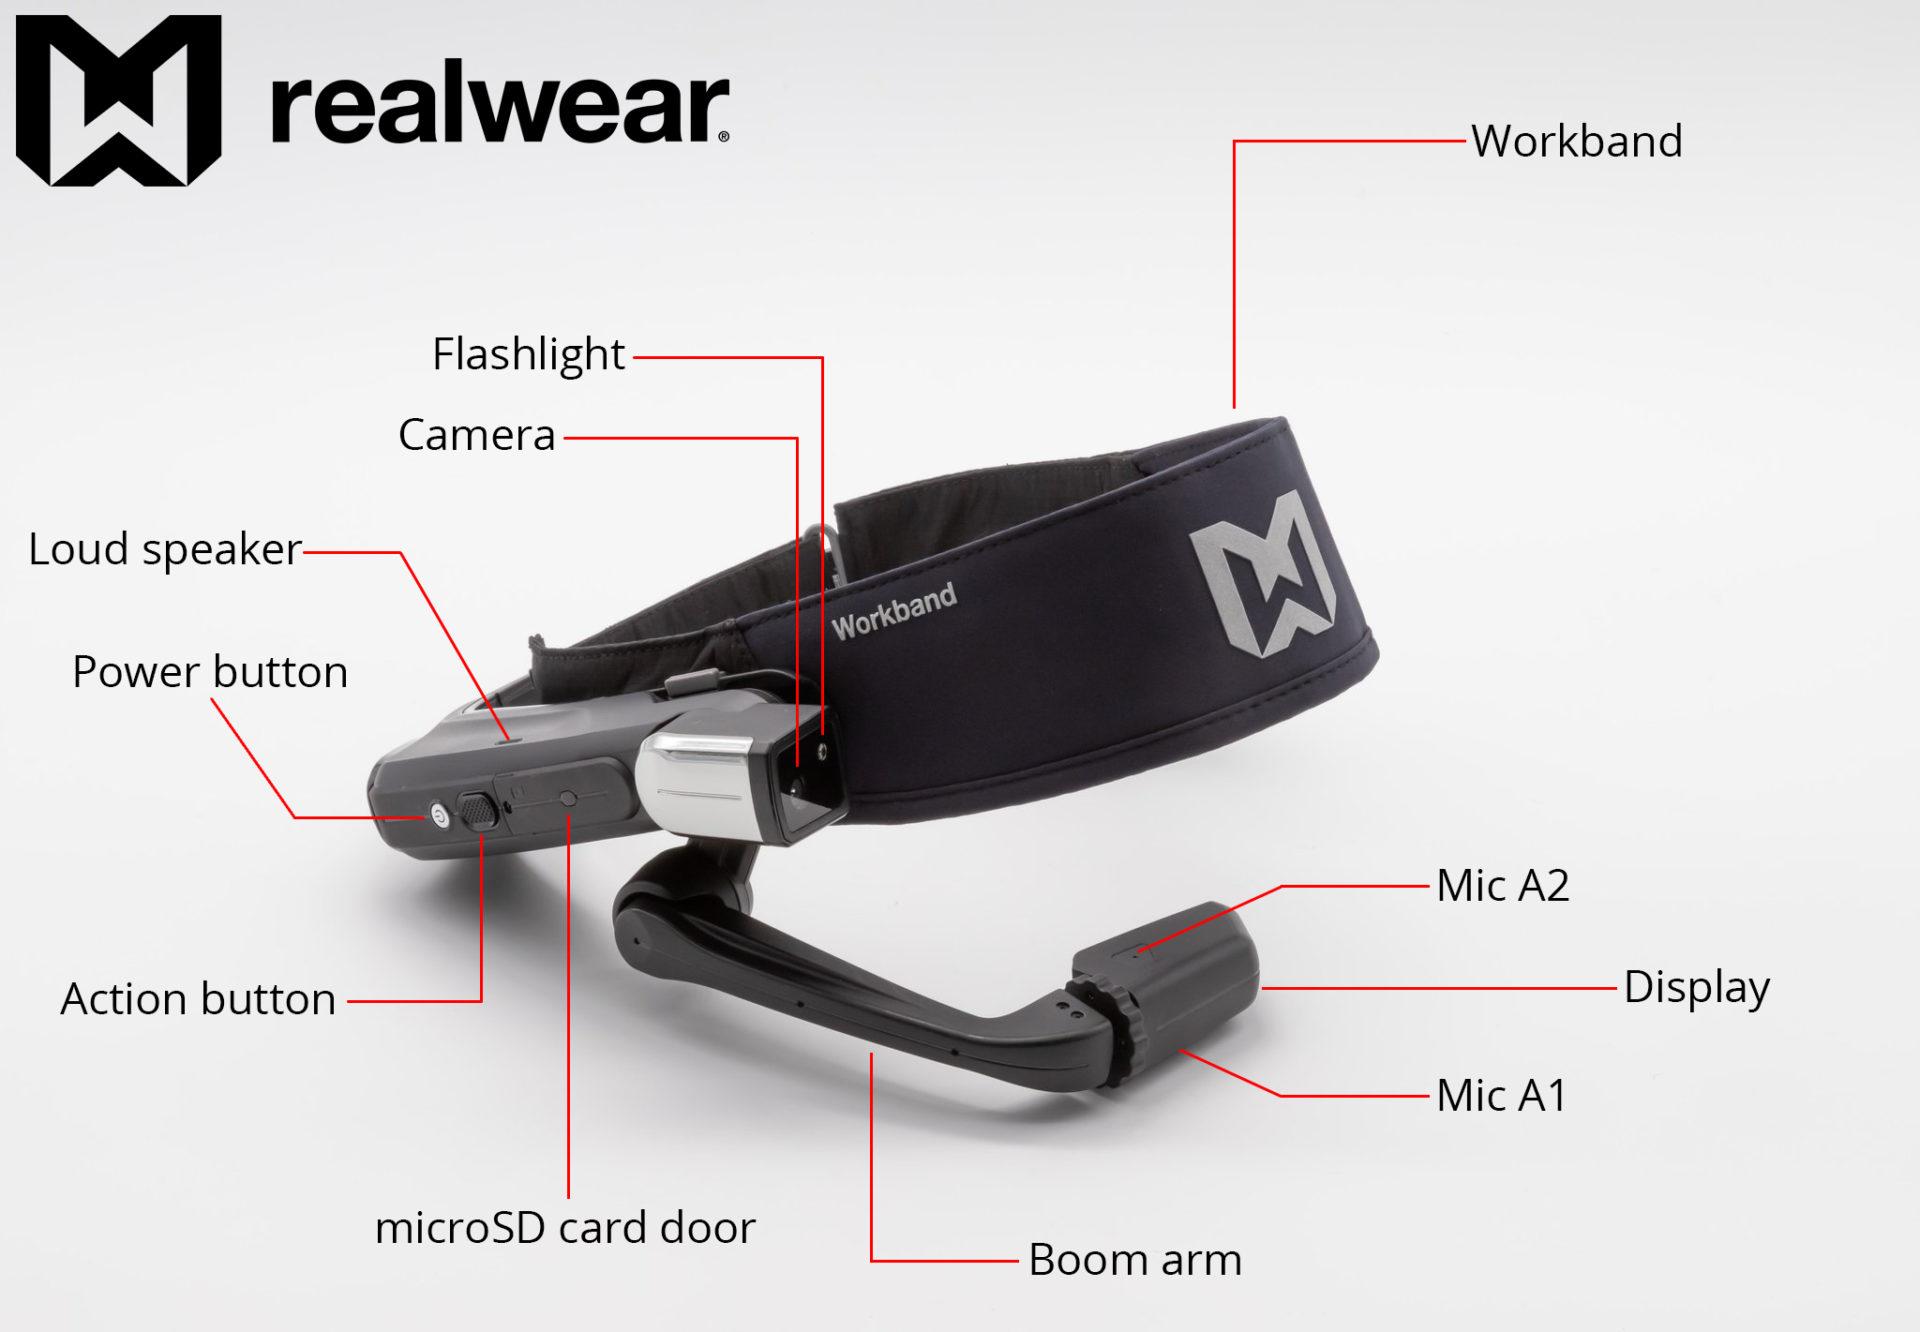 RealWear HMT-1 hardware overview